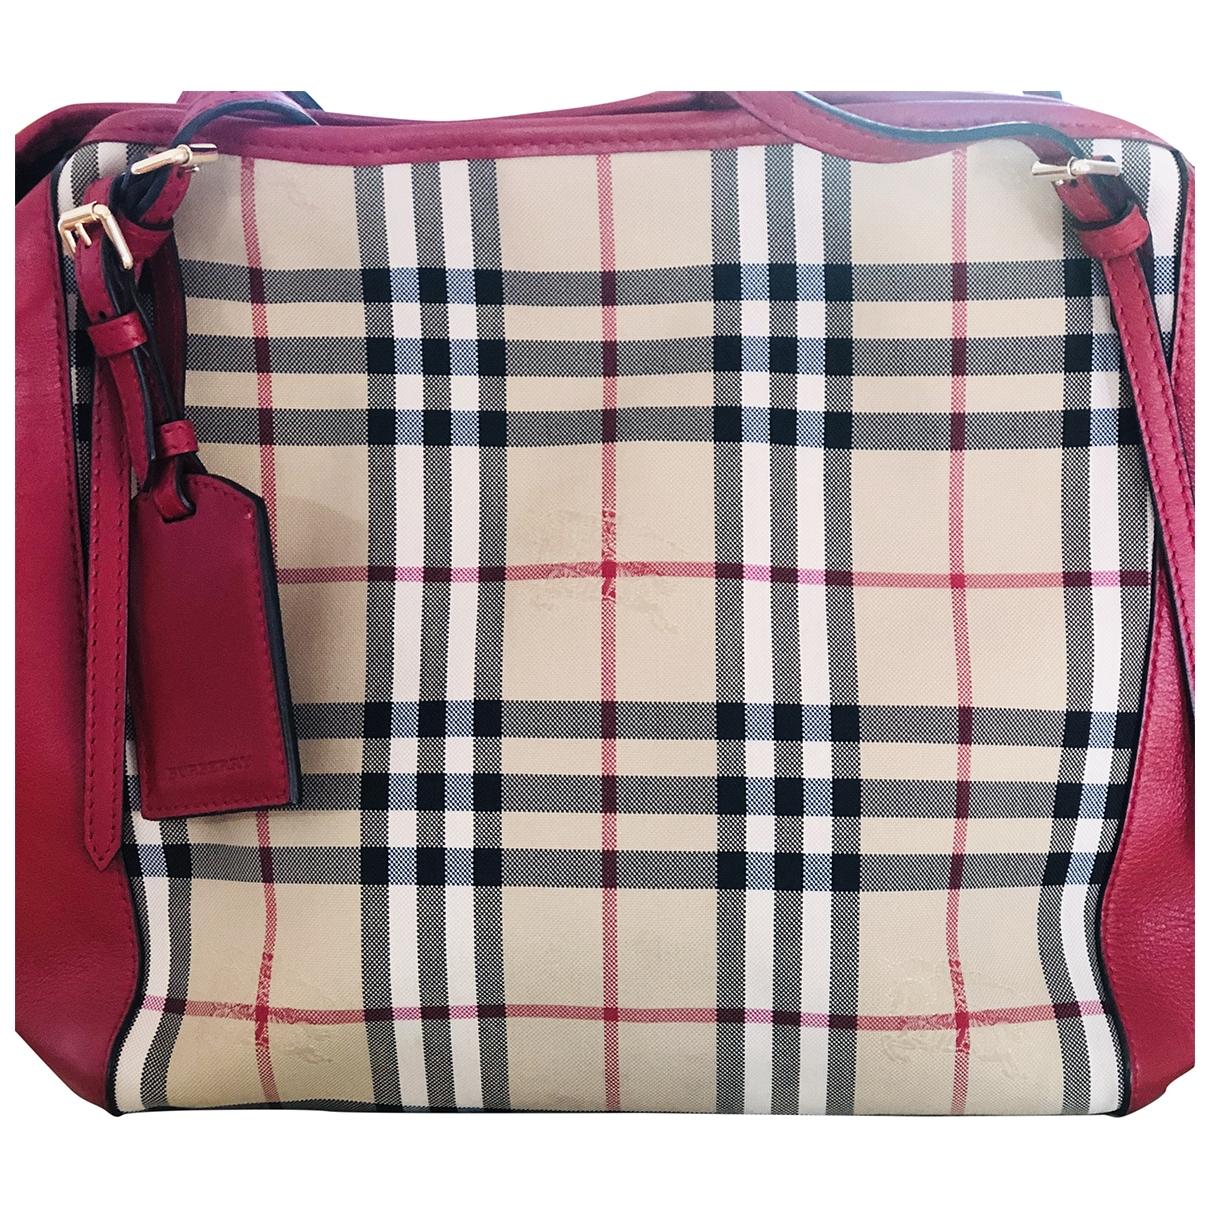 Burberry \N Handtasche in  Rot Leinen